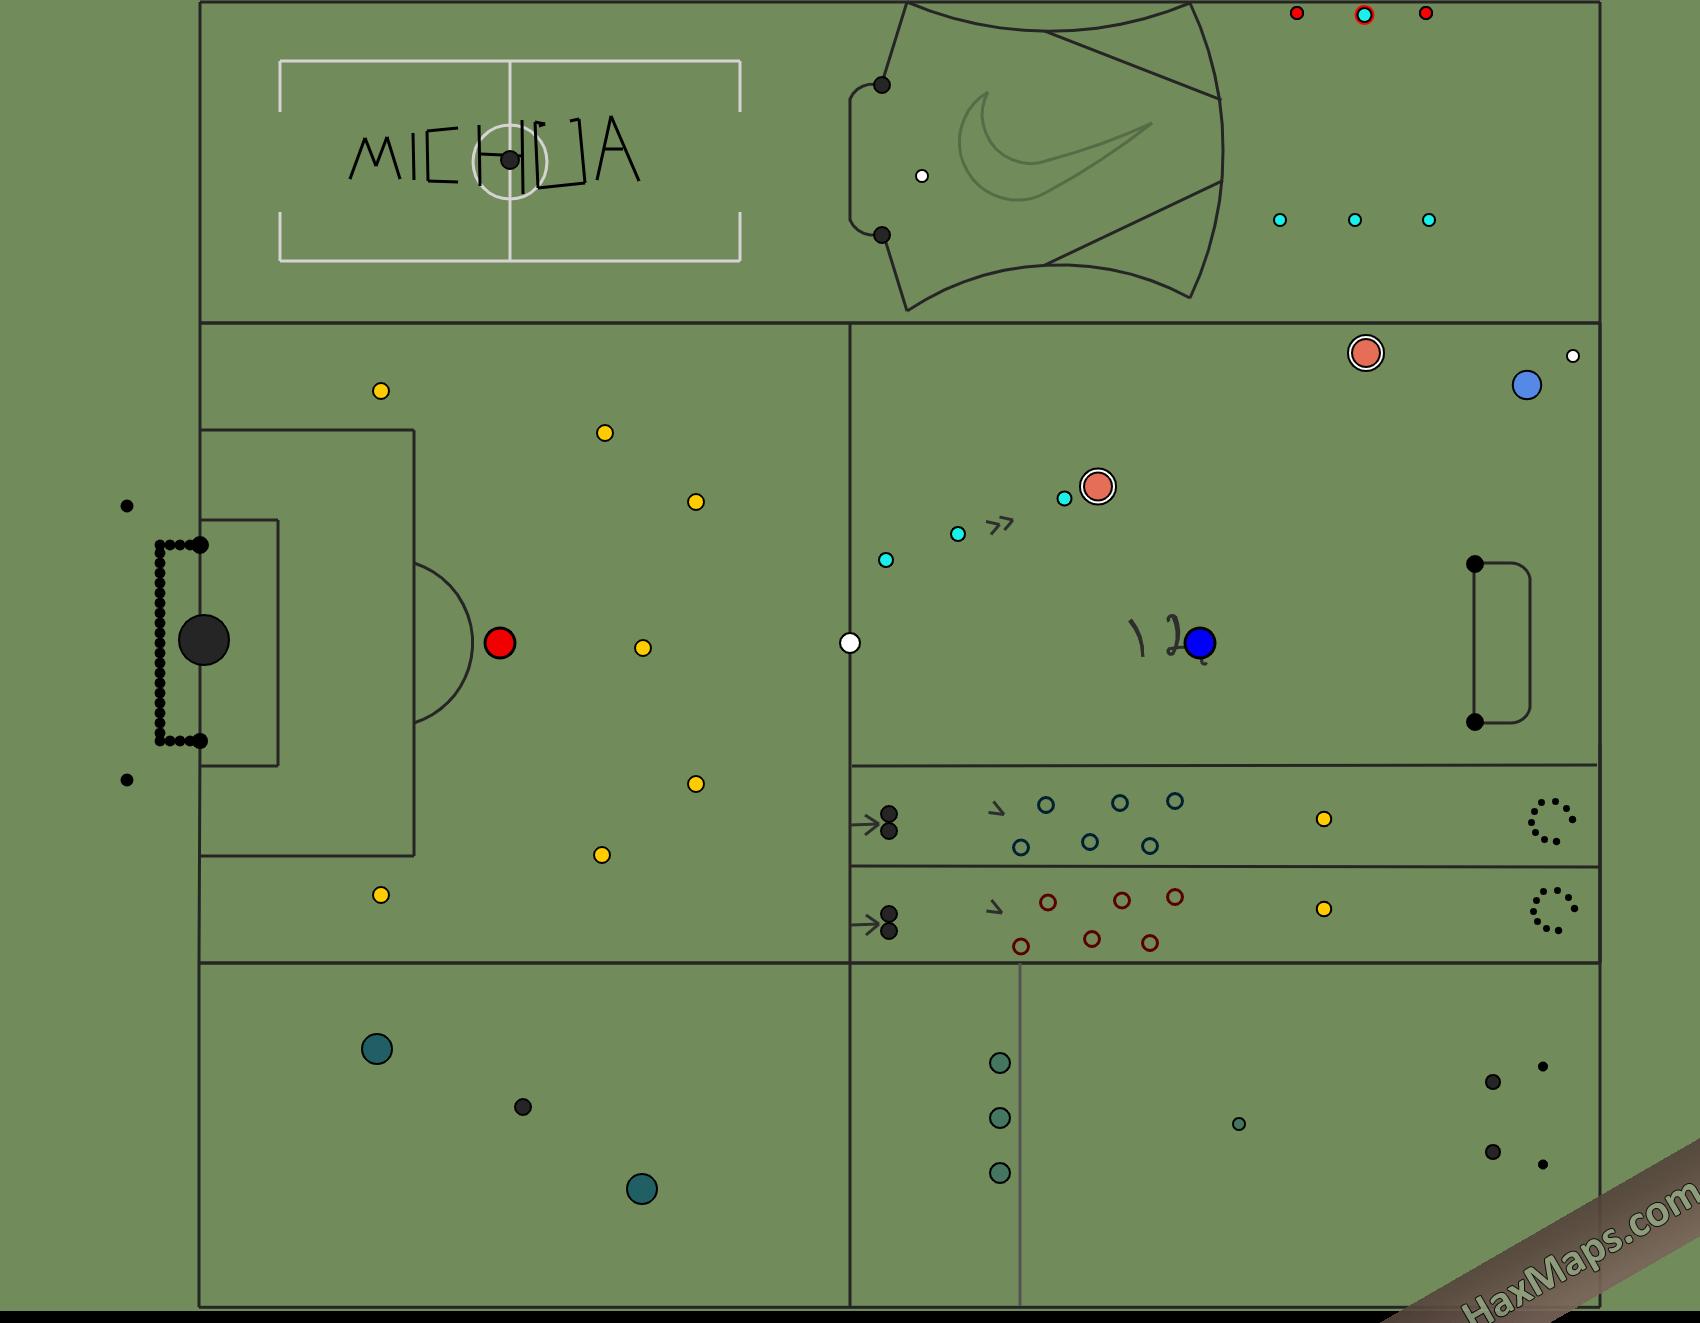 haxball maps | Michua Training Maps